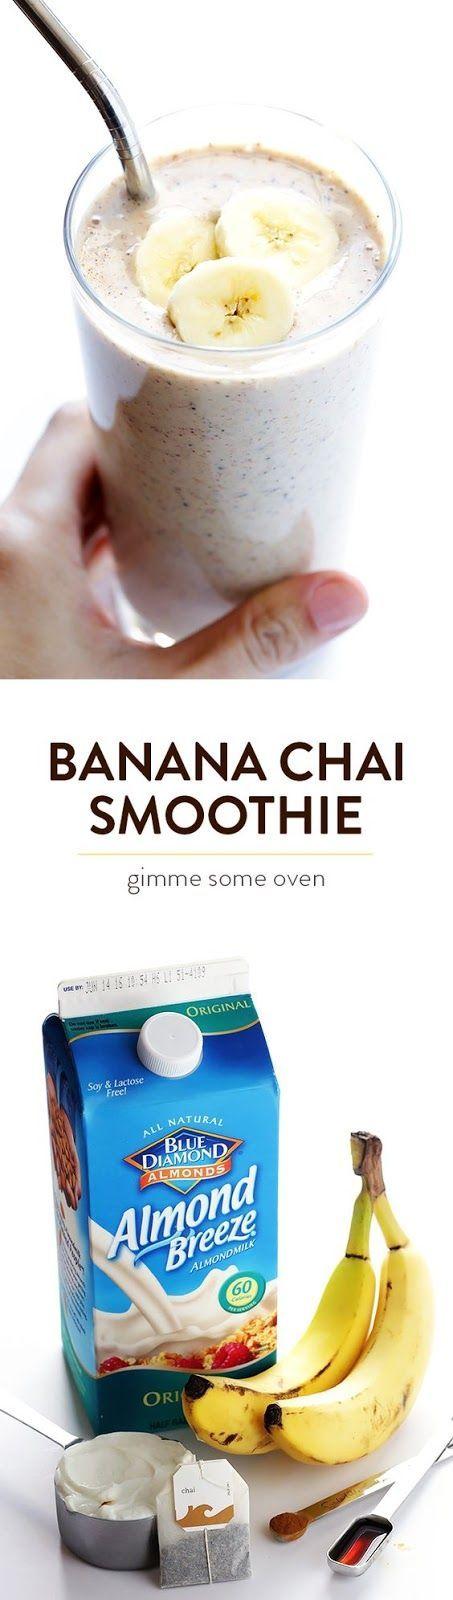 Banana Chai Smoothie: